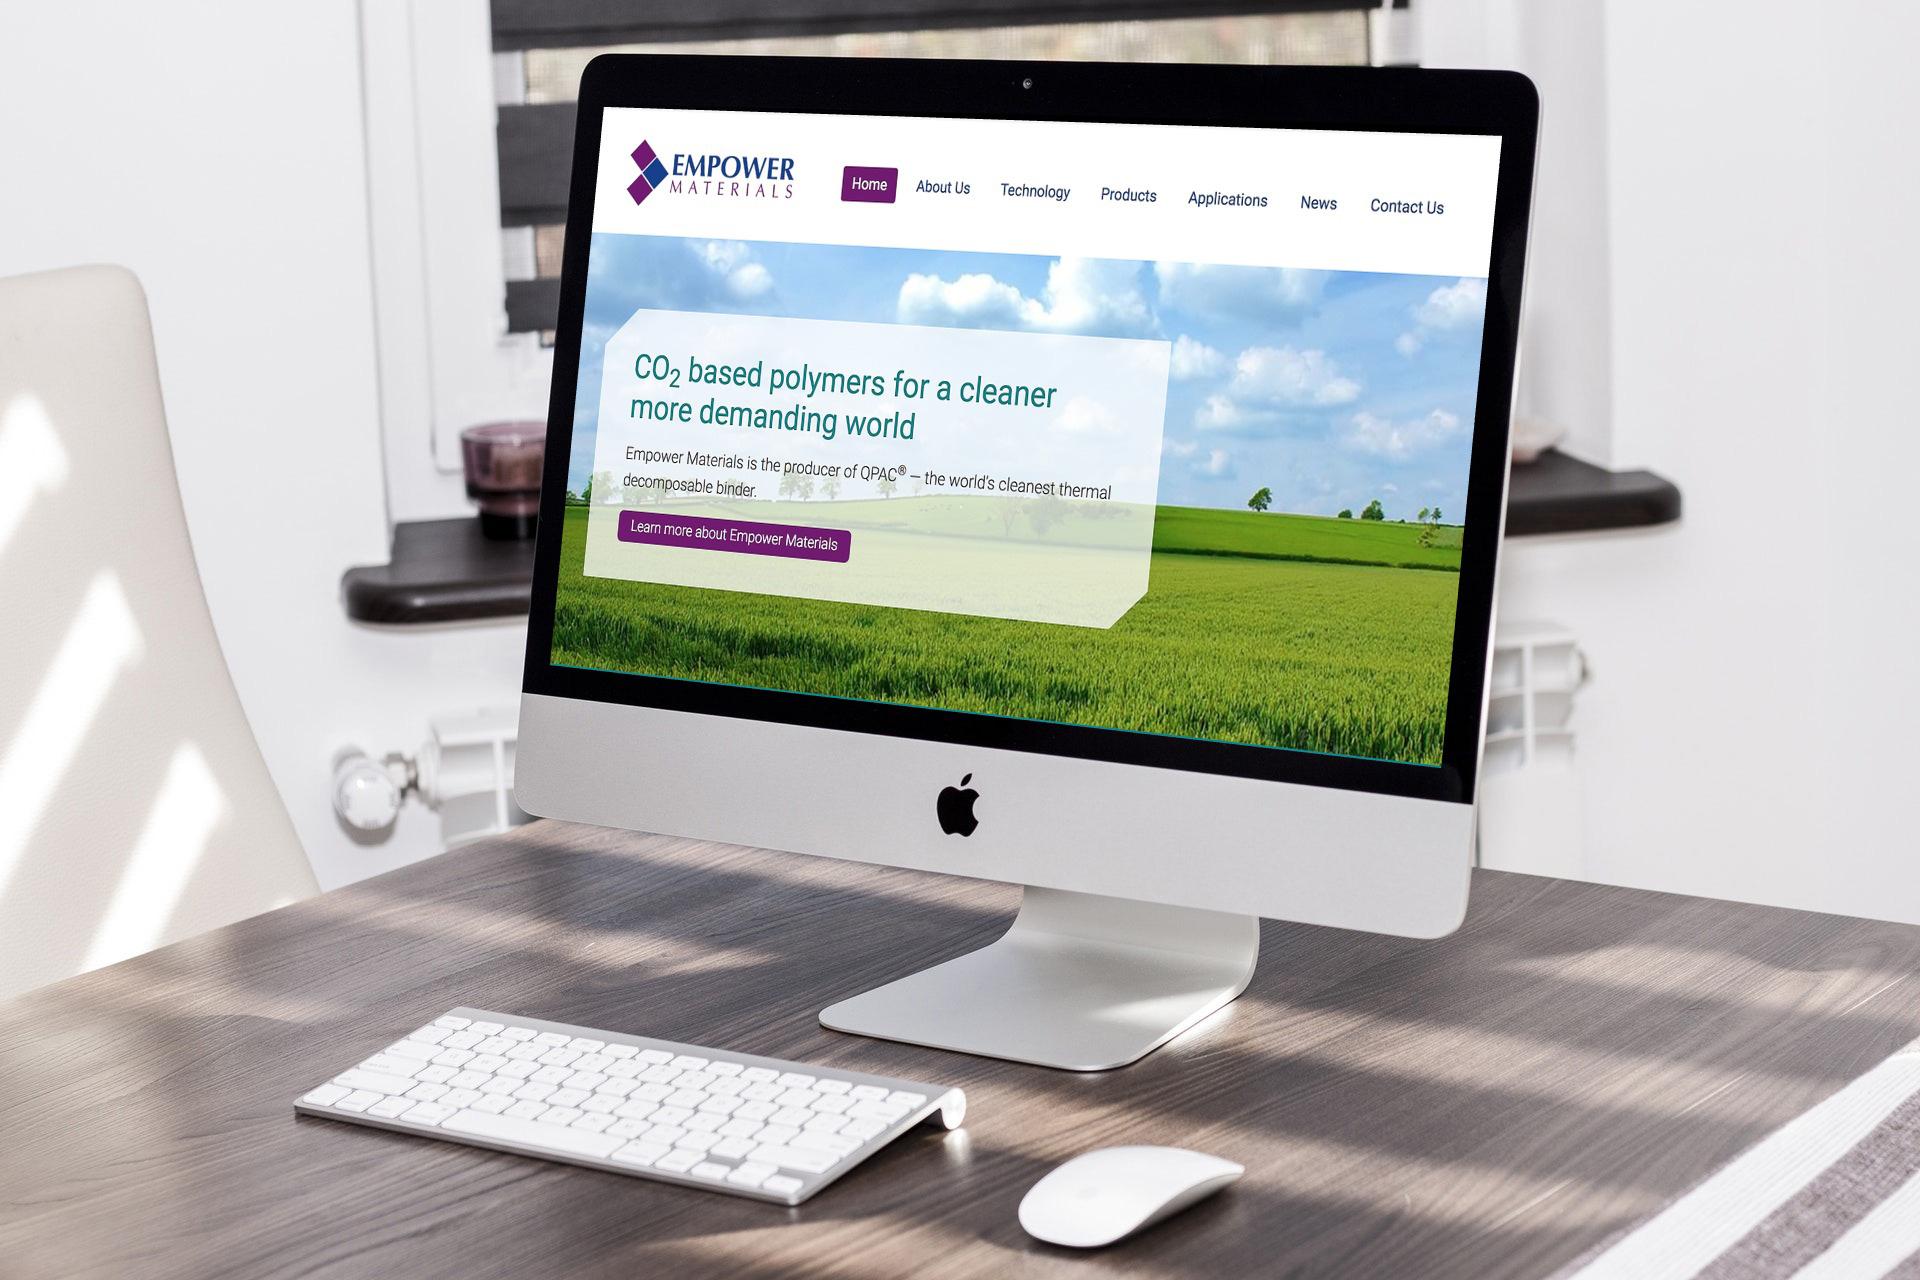 Desktop computer showing the Empower Materials website